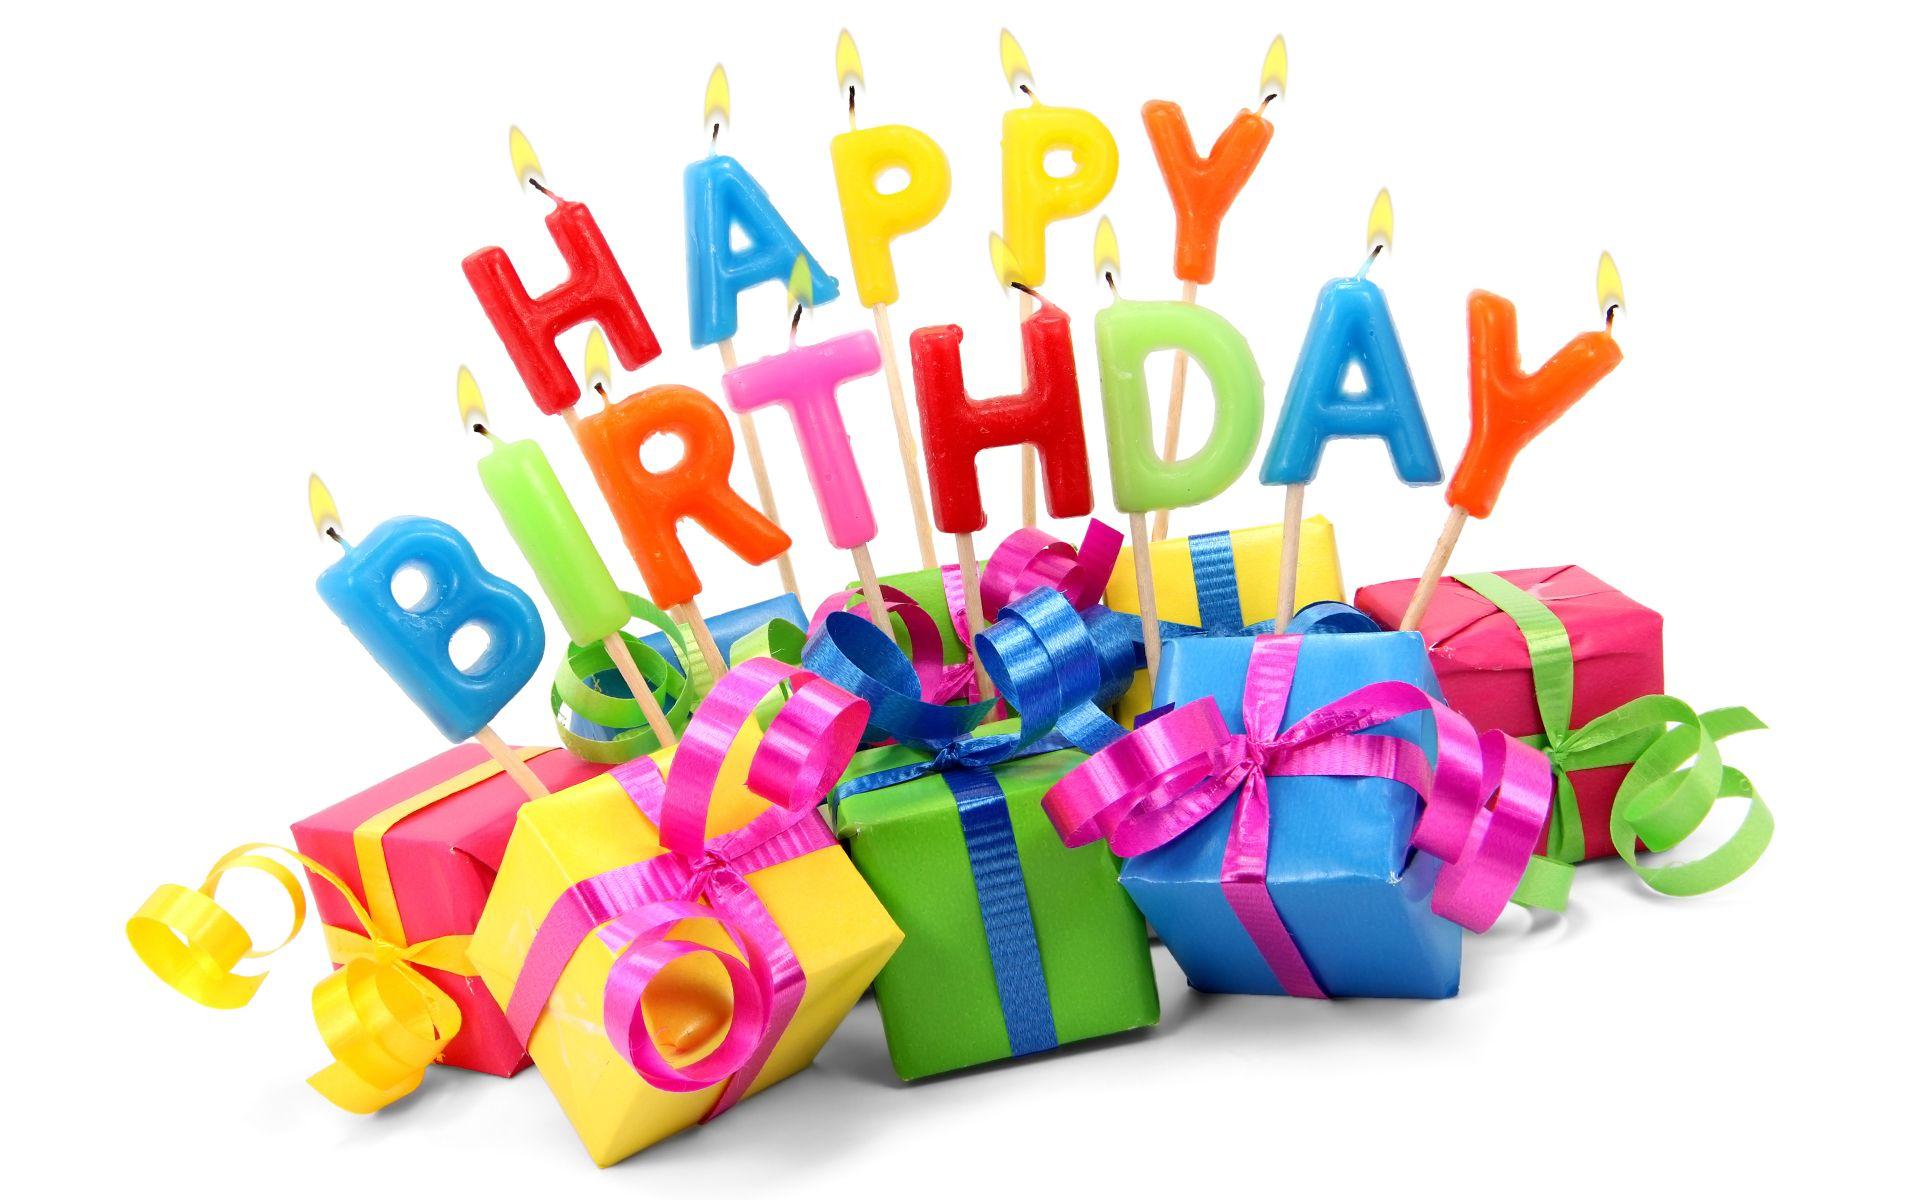 Surprise Happy Birthday Gifts 5 Jpg 1920 1200 Happy Birthday Ecard Happy Birthday Gifts Happy Birthday Fun